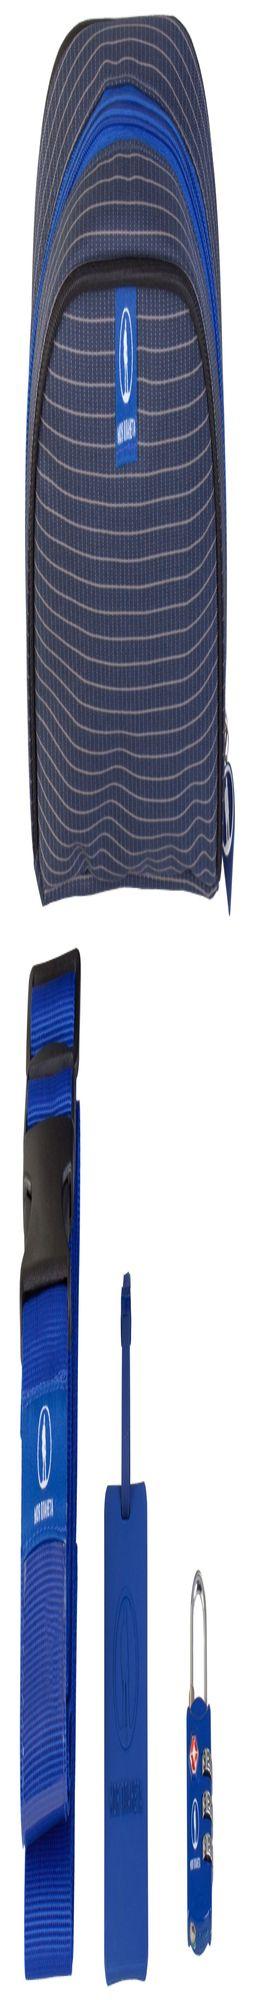 Багажный набор Safe Journey, синий фото